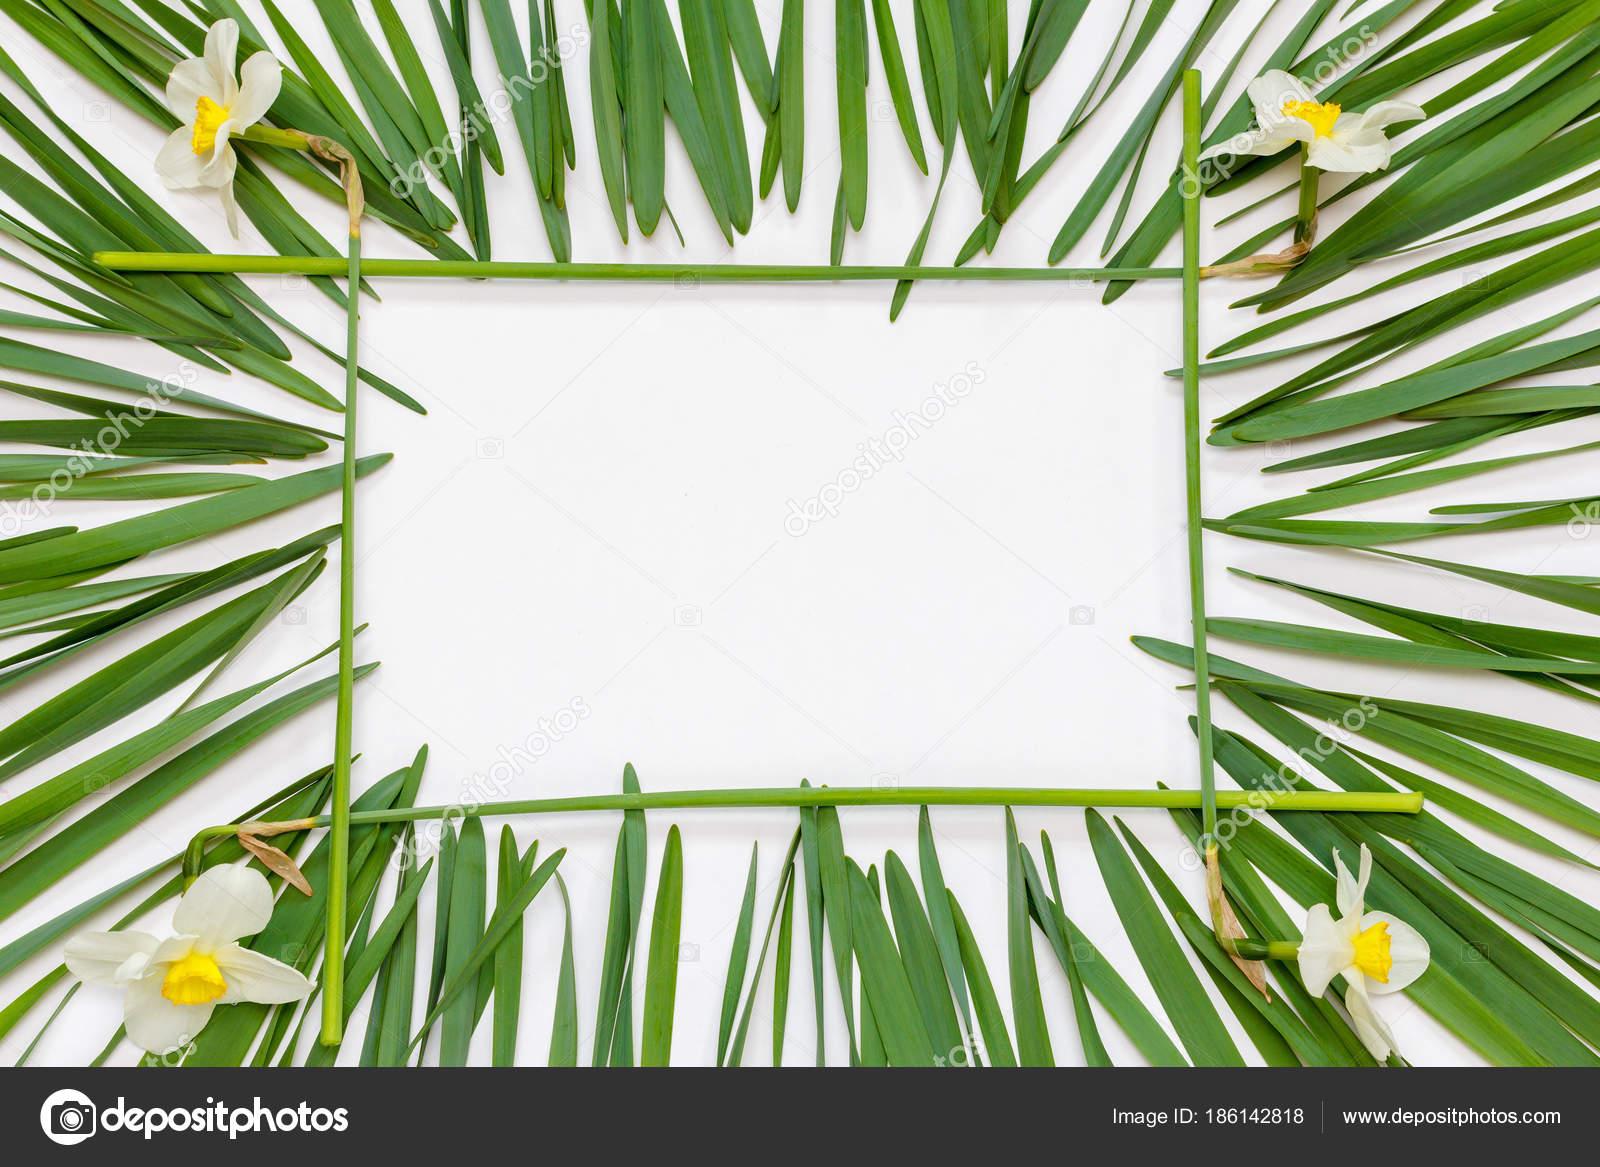 Fiori Gialli Frasi.Cornice Rettangolare Floreale Fiori Gialli Narcisi Foglie Verdi